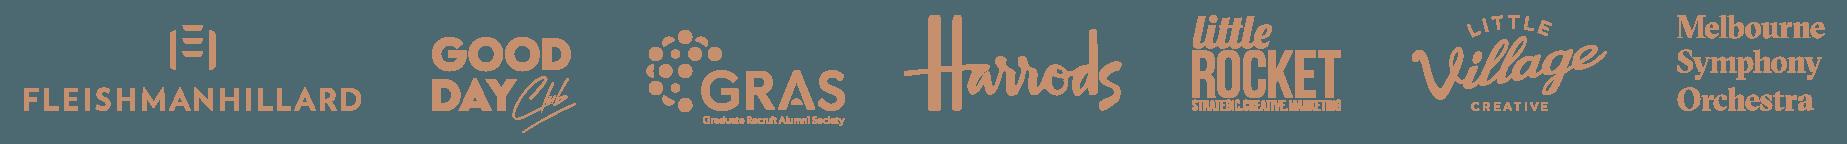 Clients: Fleishman Hillard, Good Day Club, GRAS Graduate Recruit Alumni Society, Harrods, Little Rocket, Little Village, Melbourne Symphony Orchestra